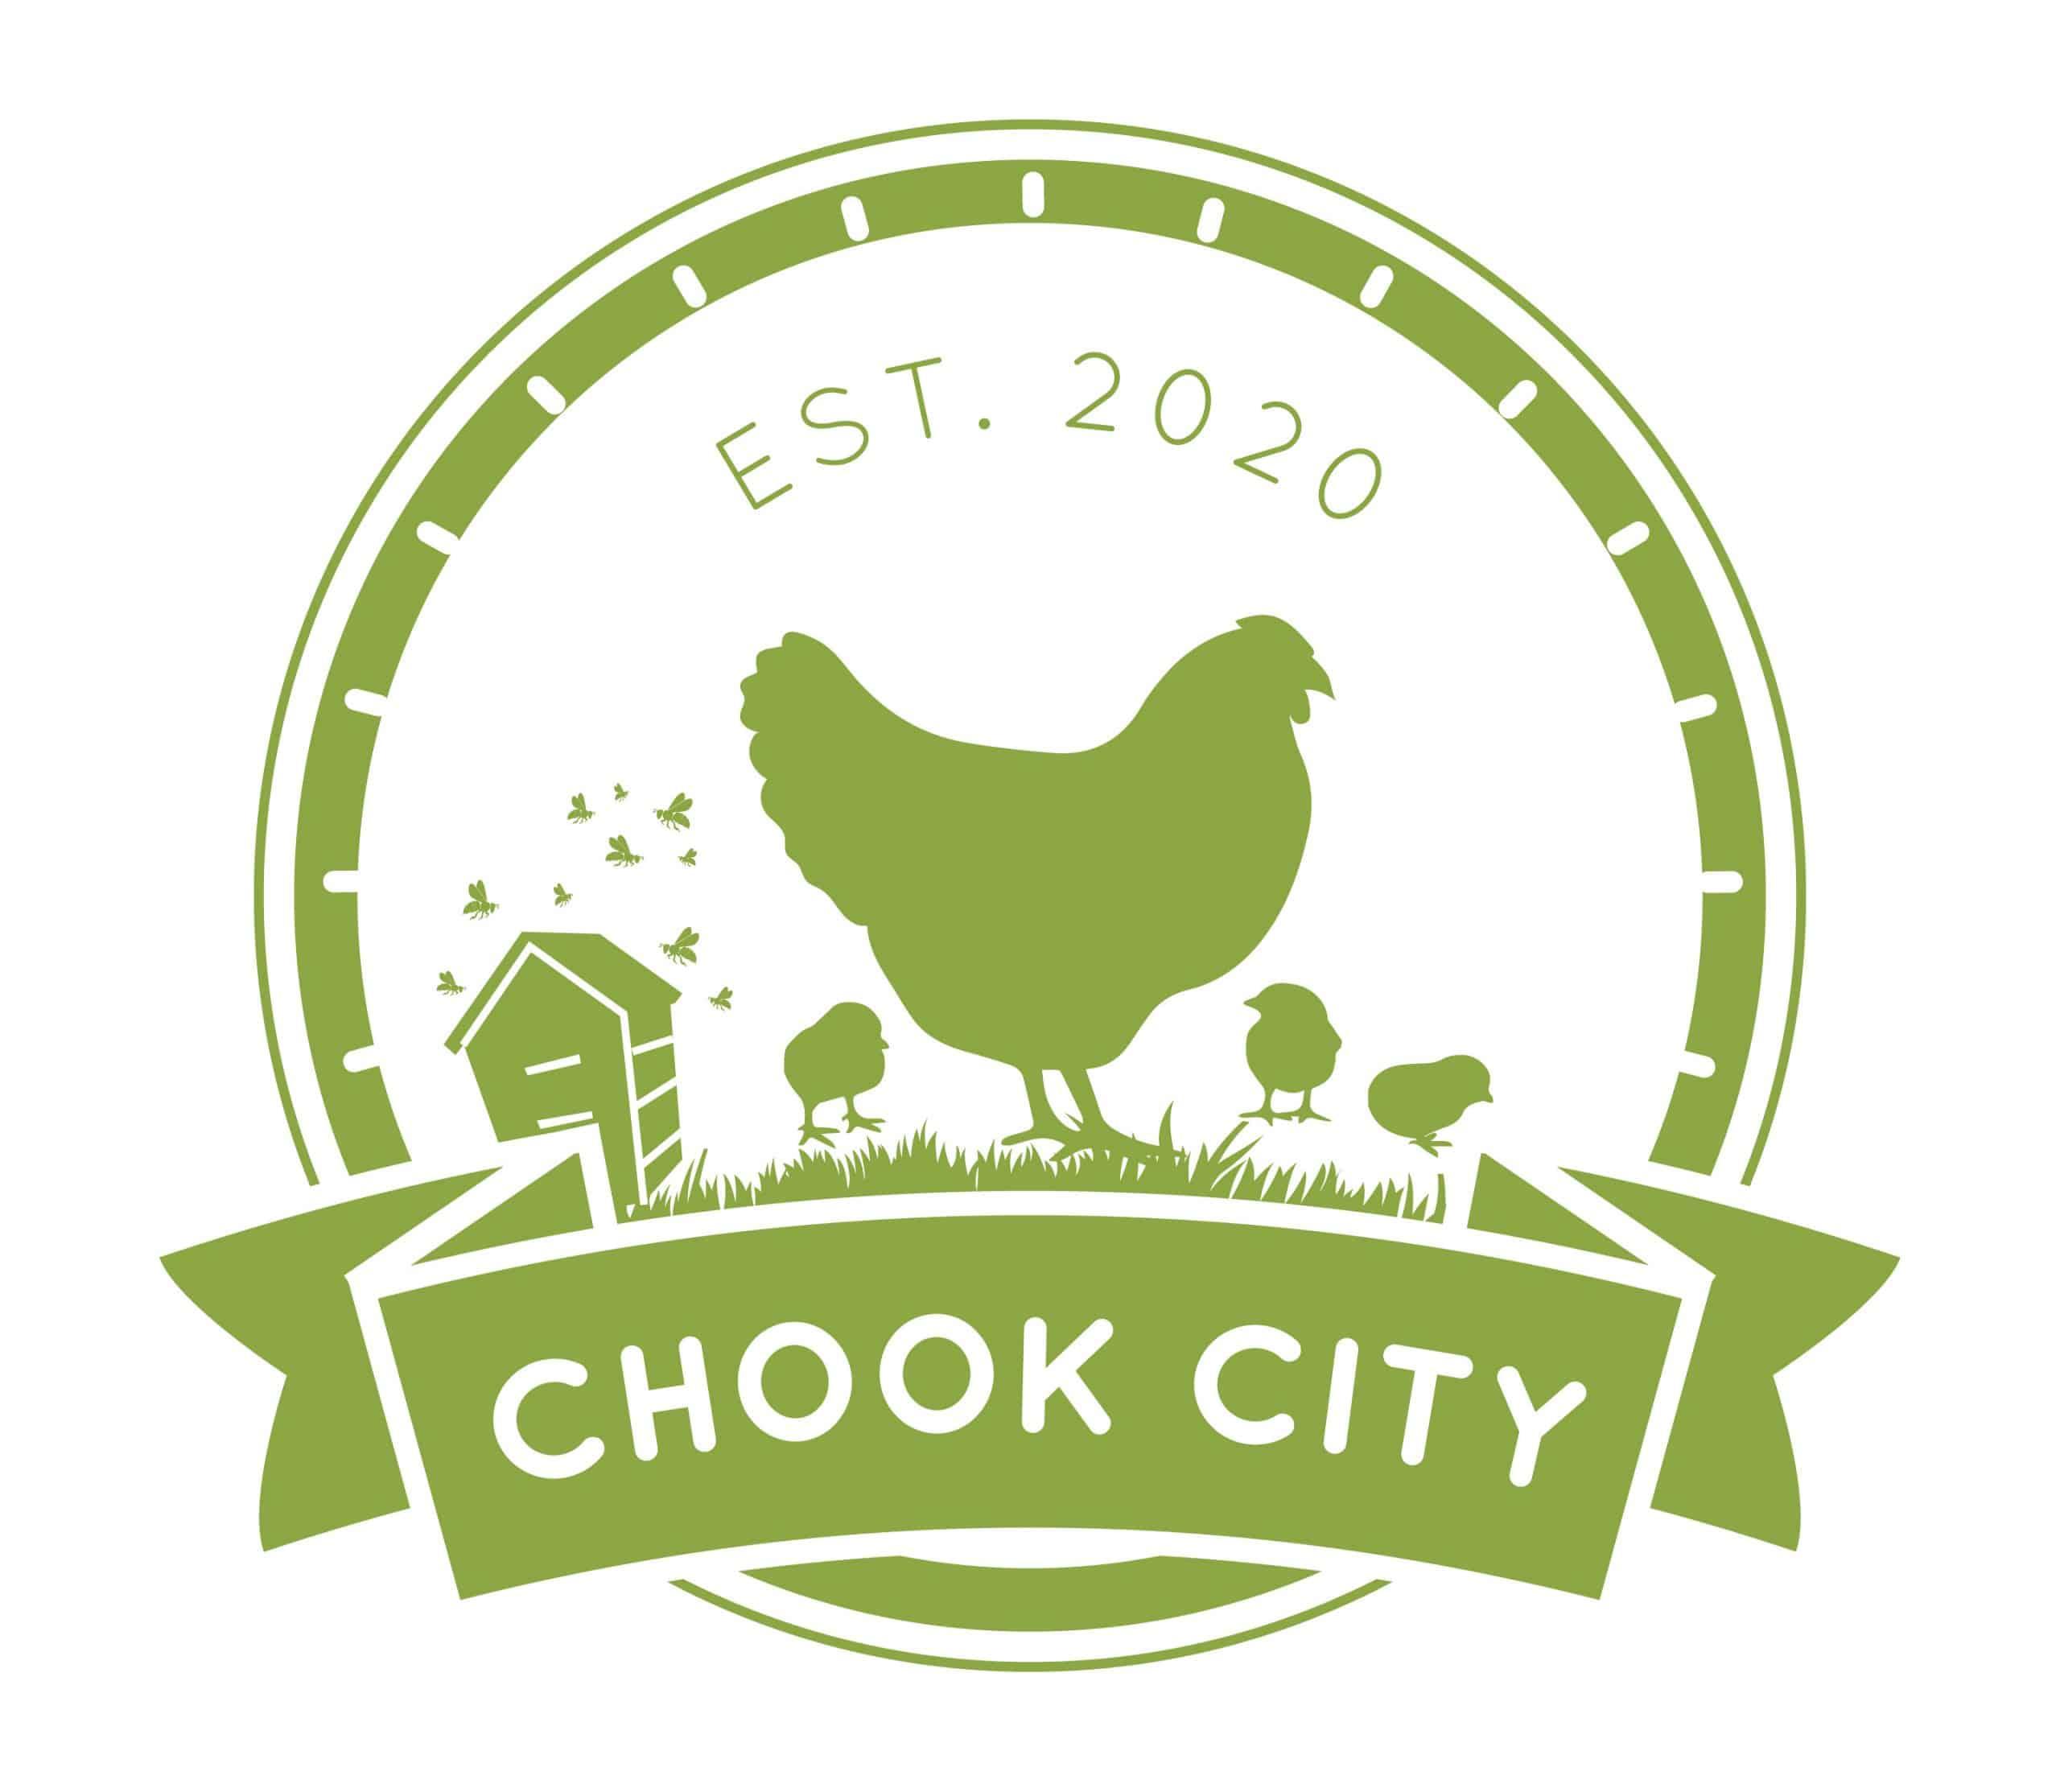 Chook City